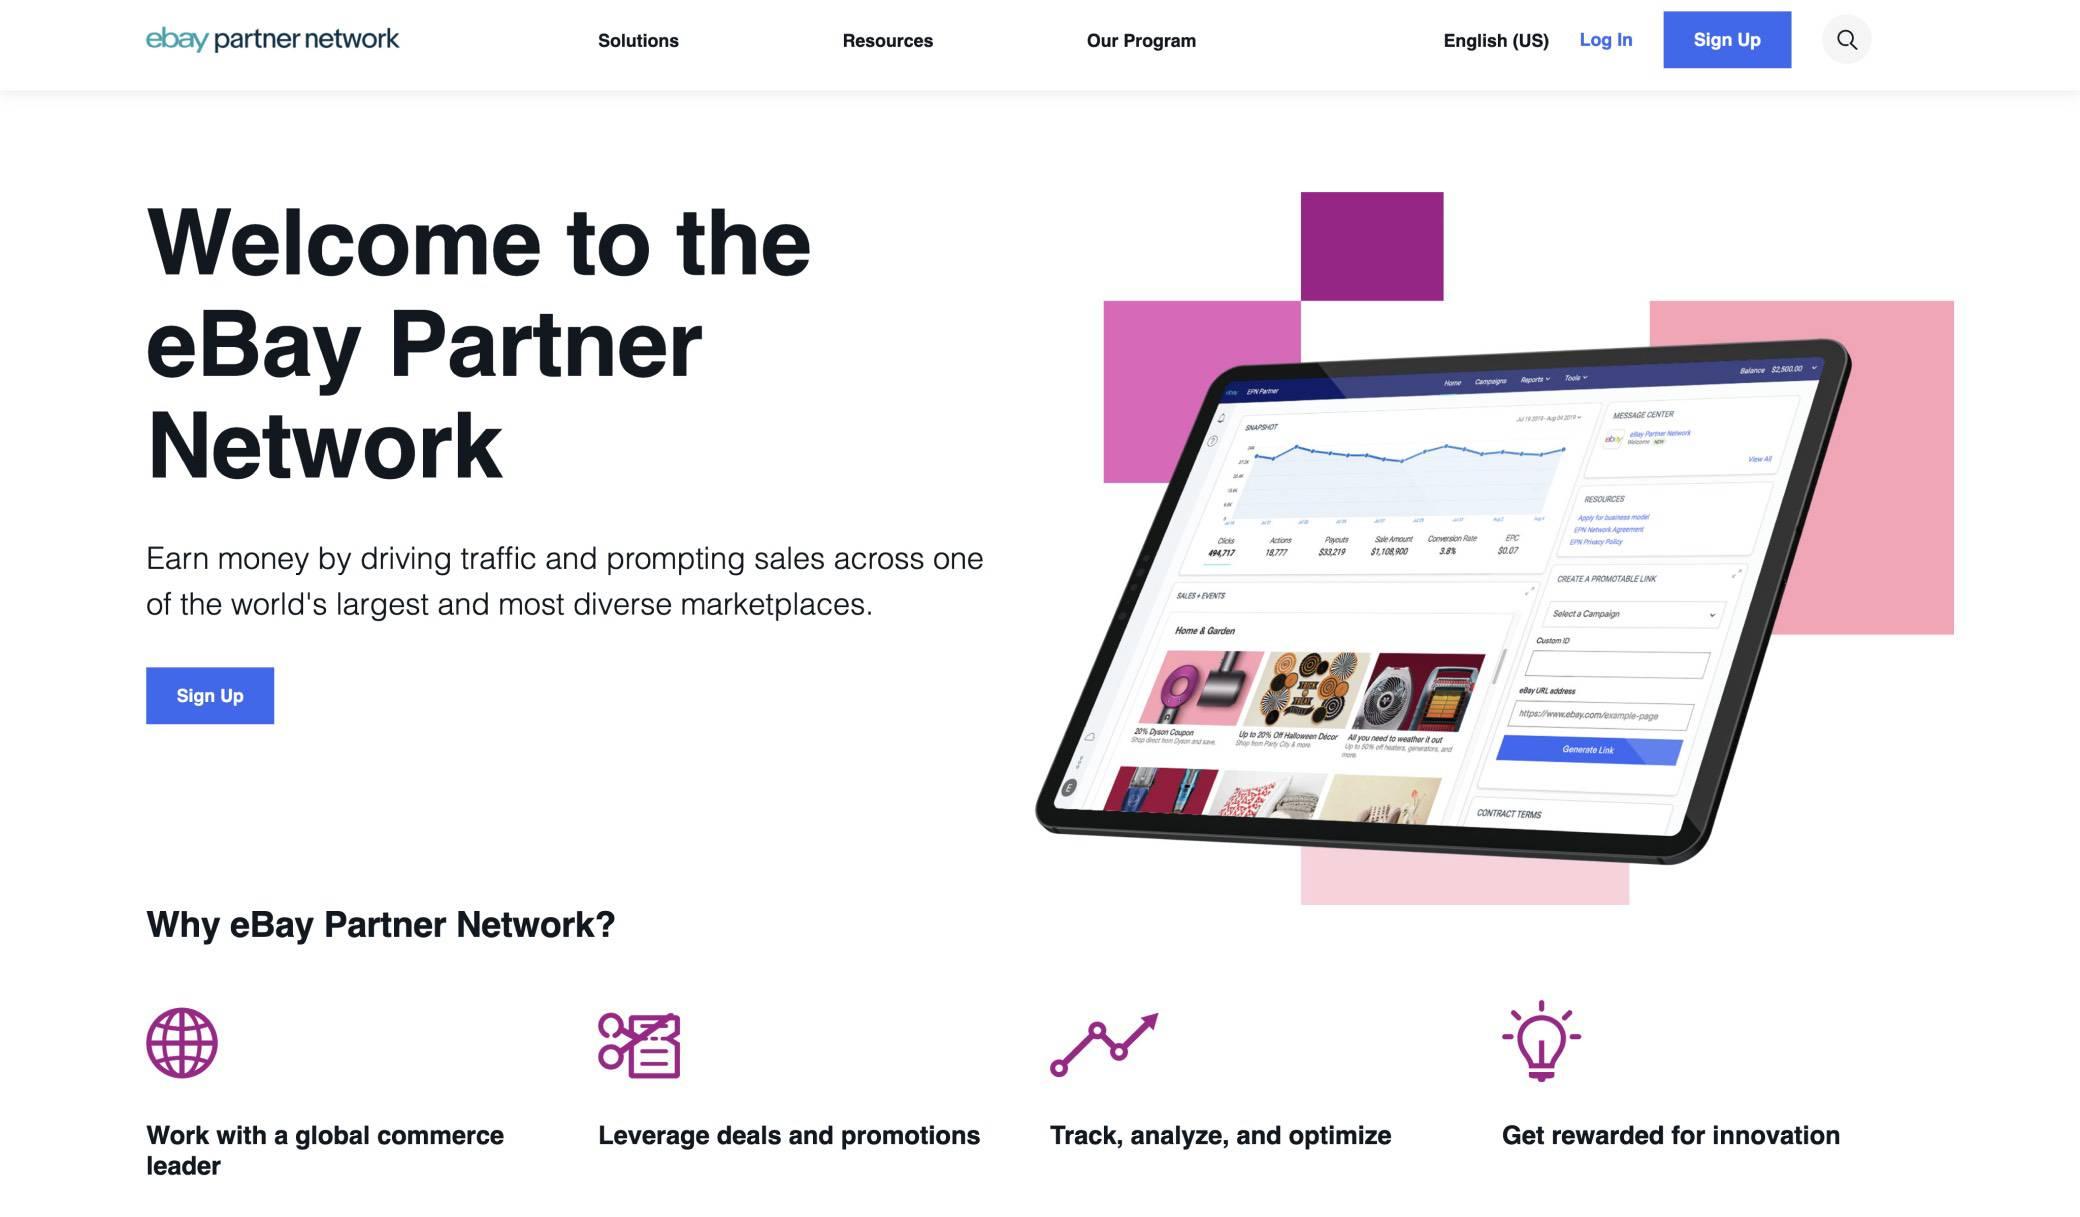 ebay-partner-network image